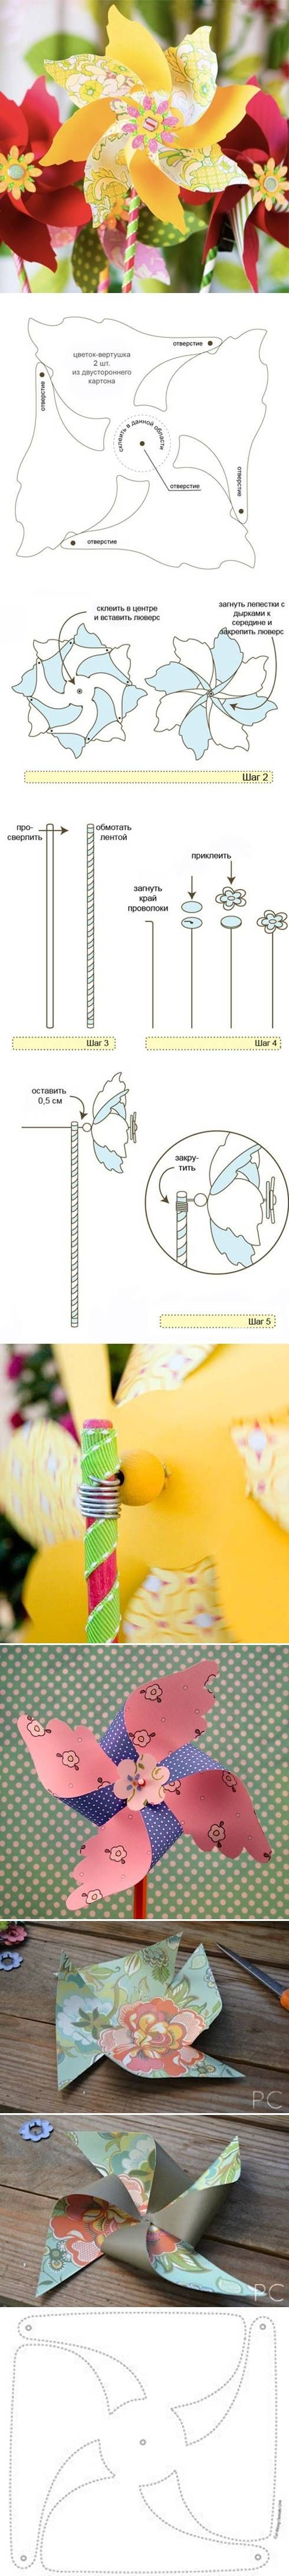 DIY Paper Windmills